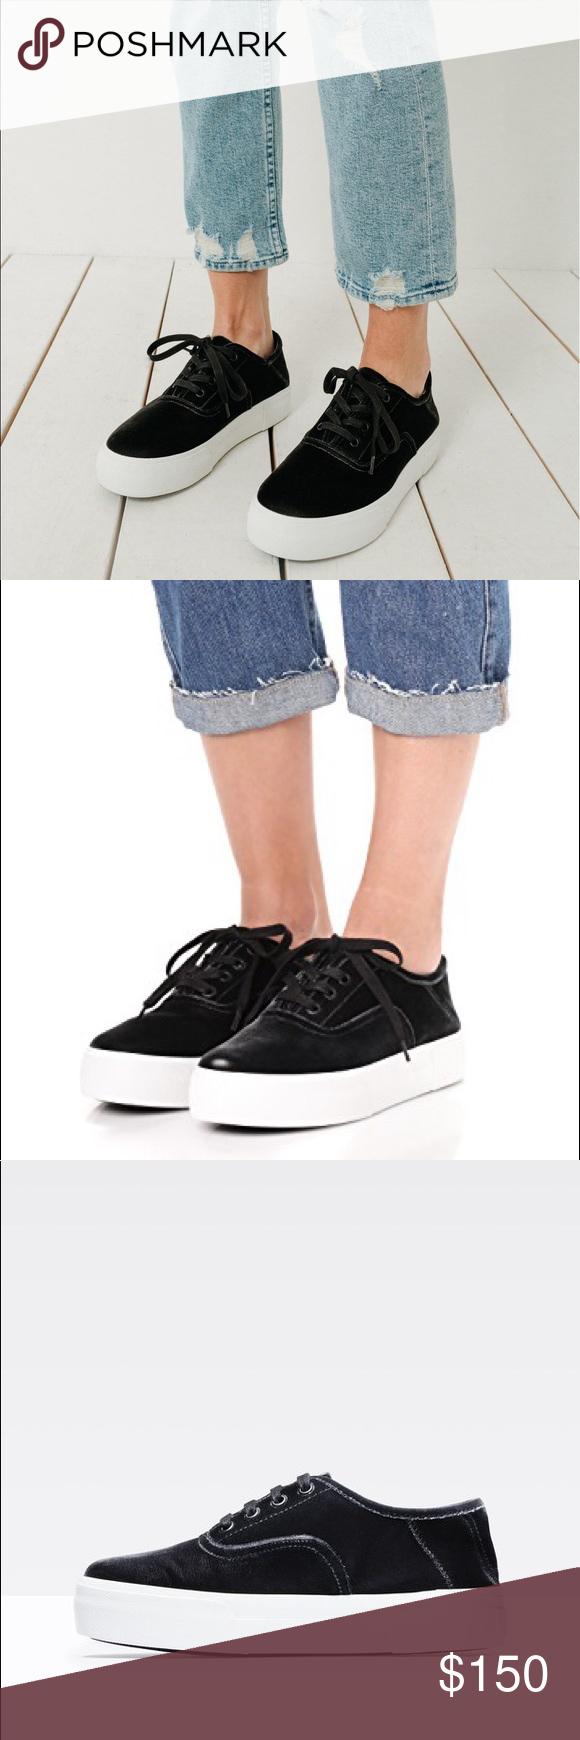 95099161fc9a Vince Copley Platform Velvet Sneaker in Black Super cute pair of Vince  Copley Sneakers in Black Velvet. A wardrobe-essential sneaker becomes the  height of ...